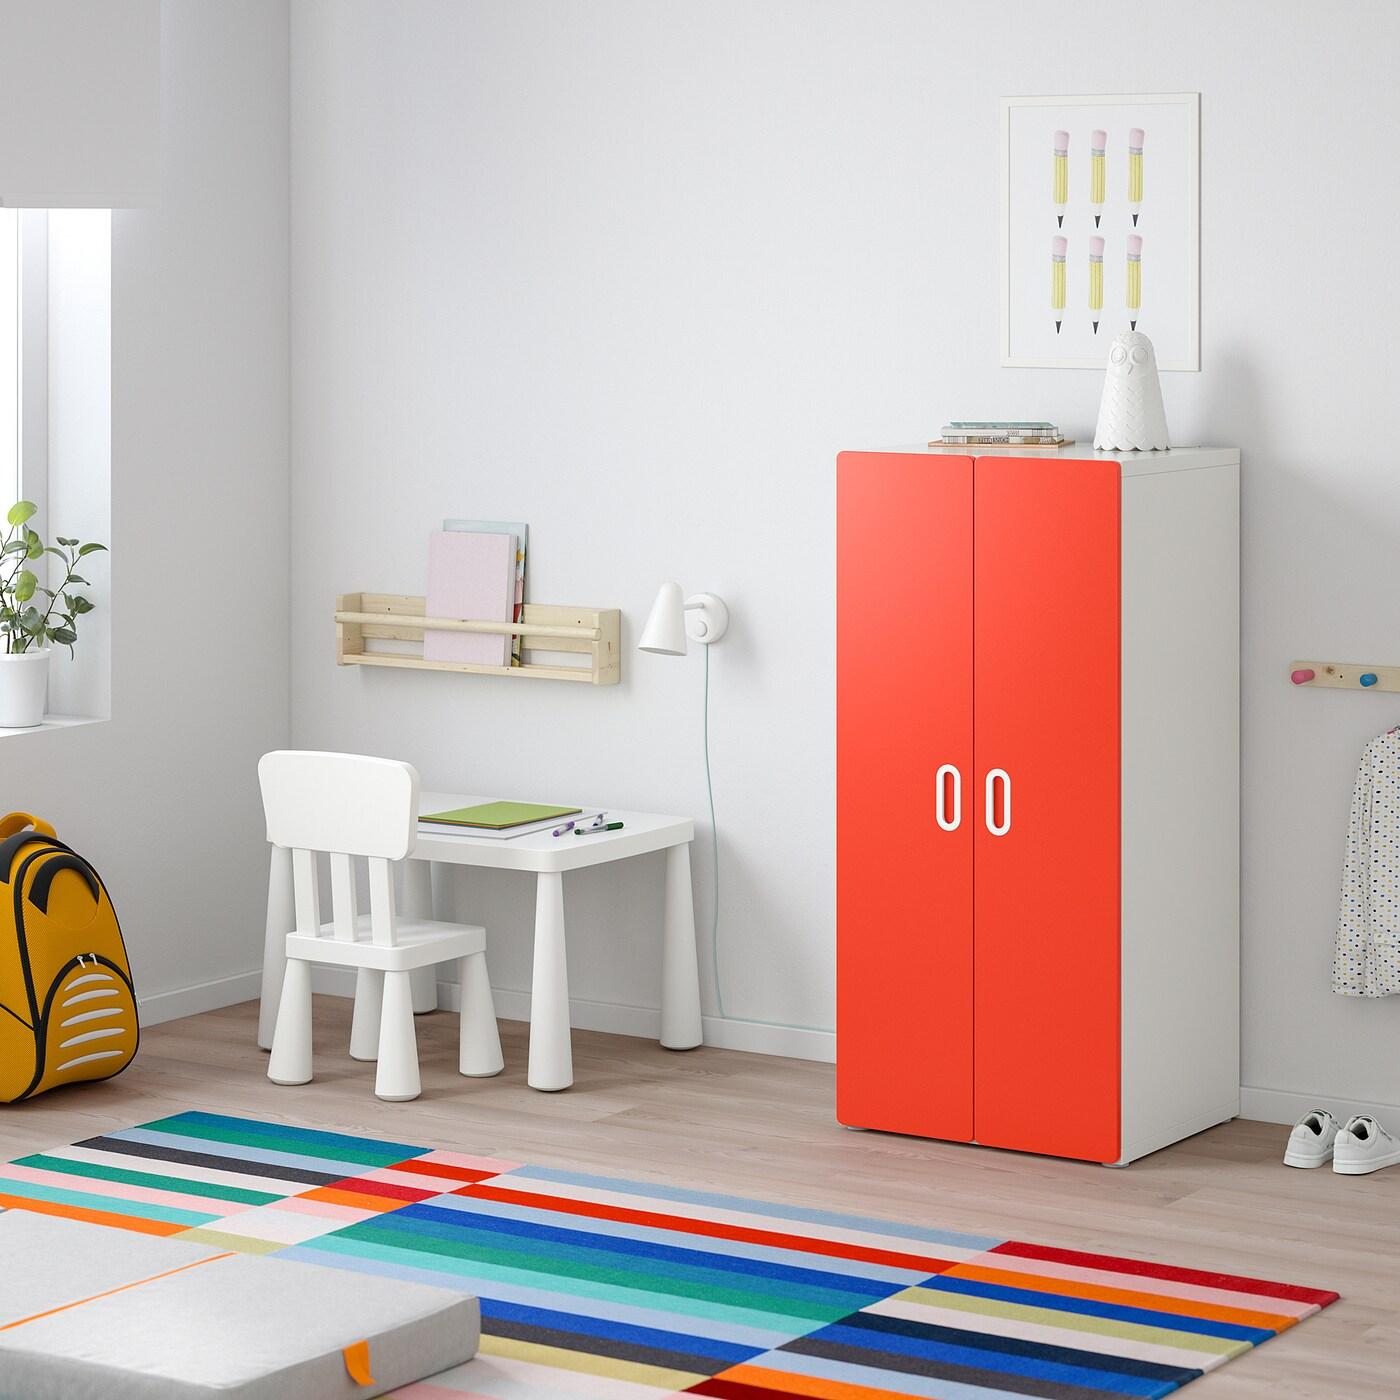 STUVA / FRITIDS Wardrobe, white/red, 60x50x128 cm